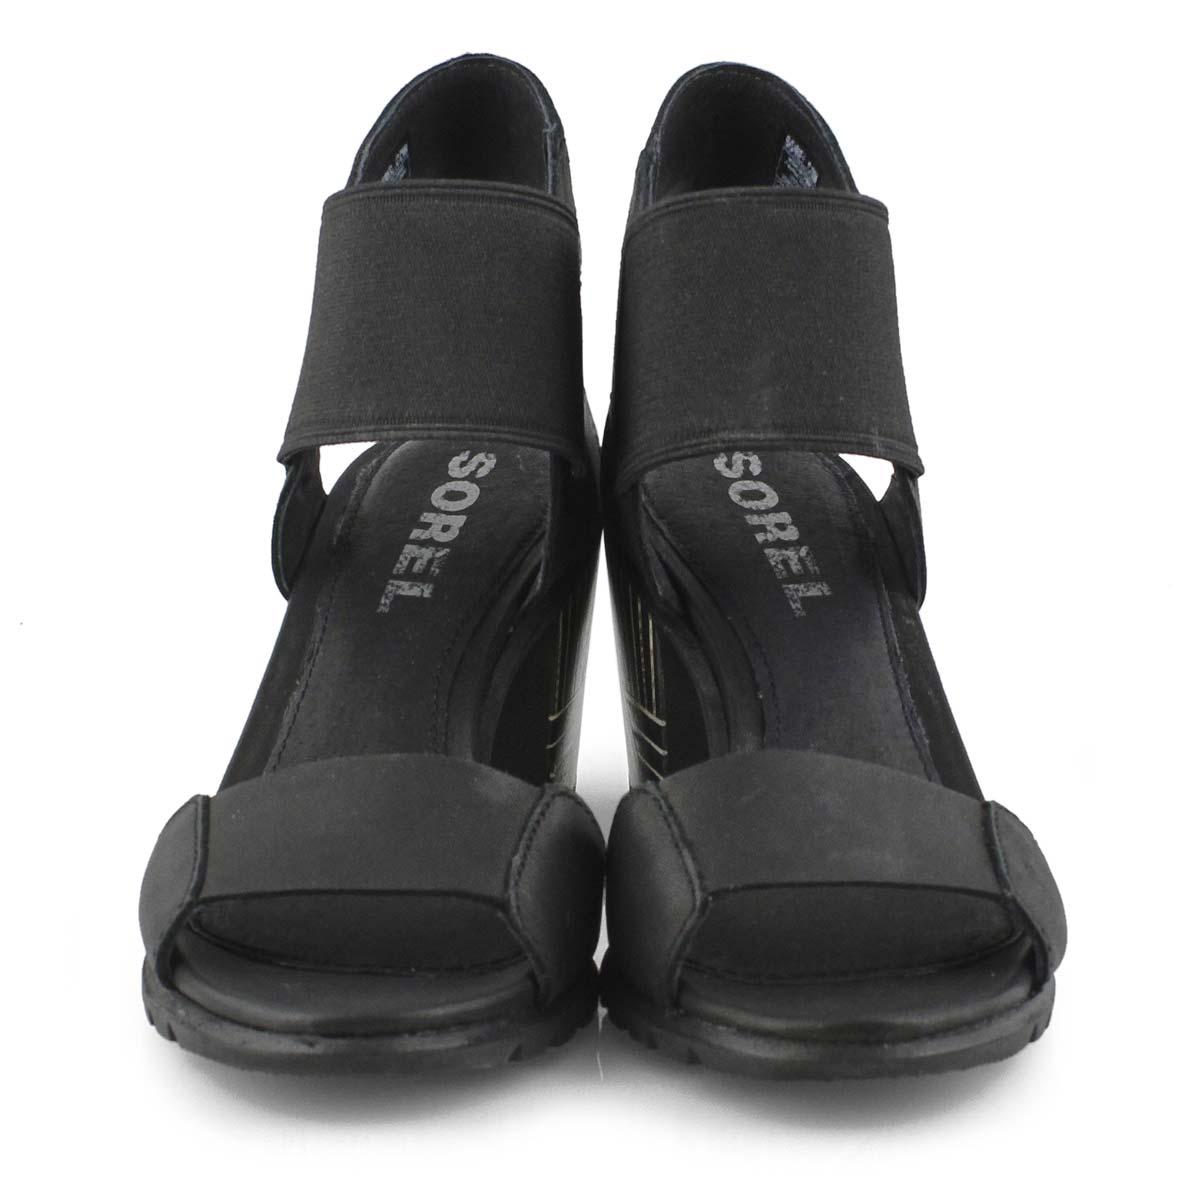 Lds Nadia black dress sandal